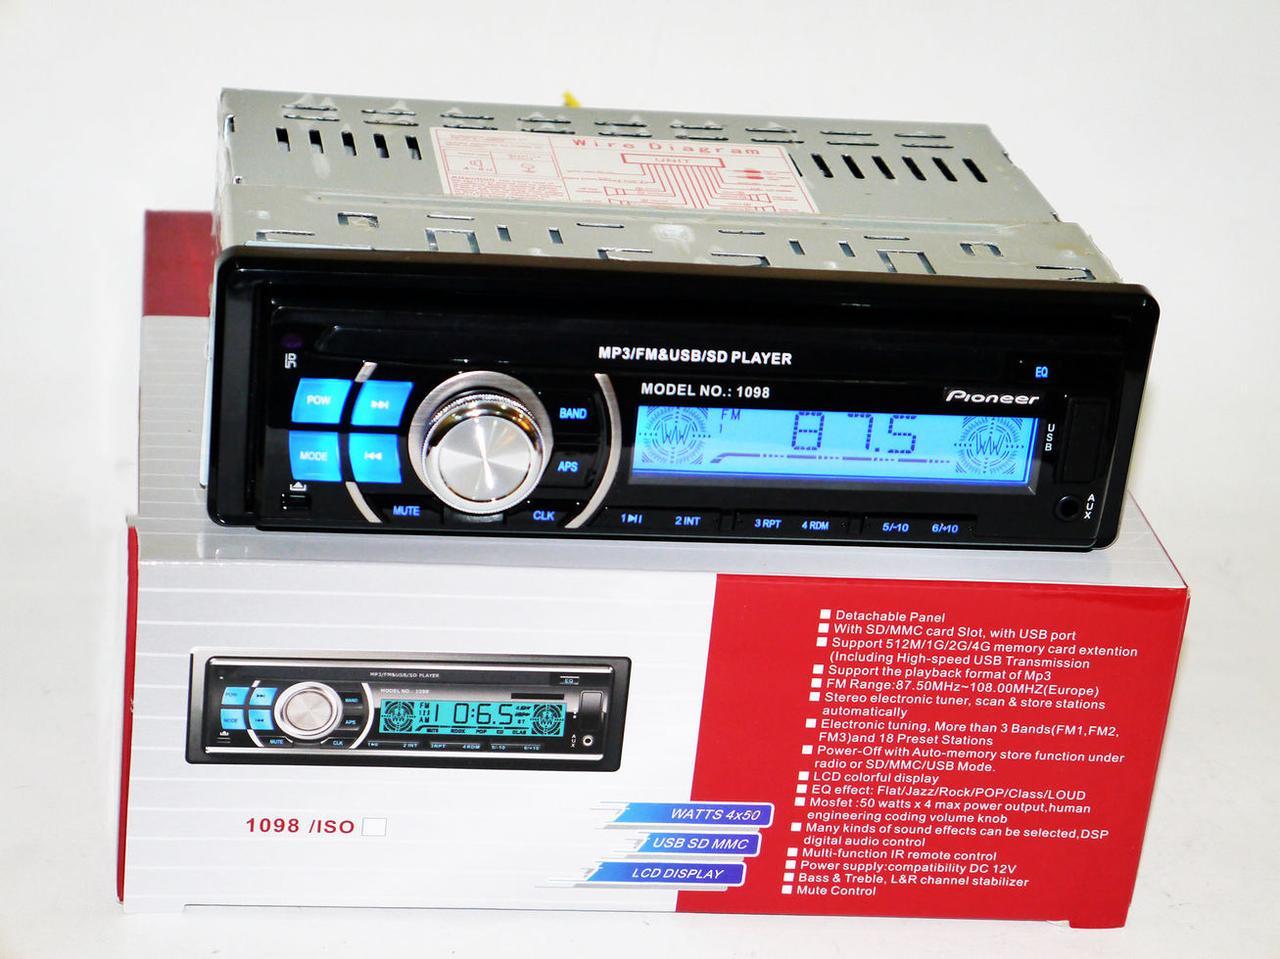 Автомагнитола Pioneer 1098 Съемная панель